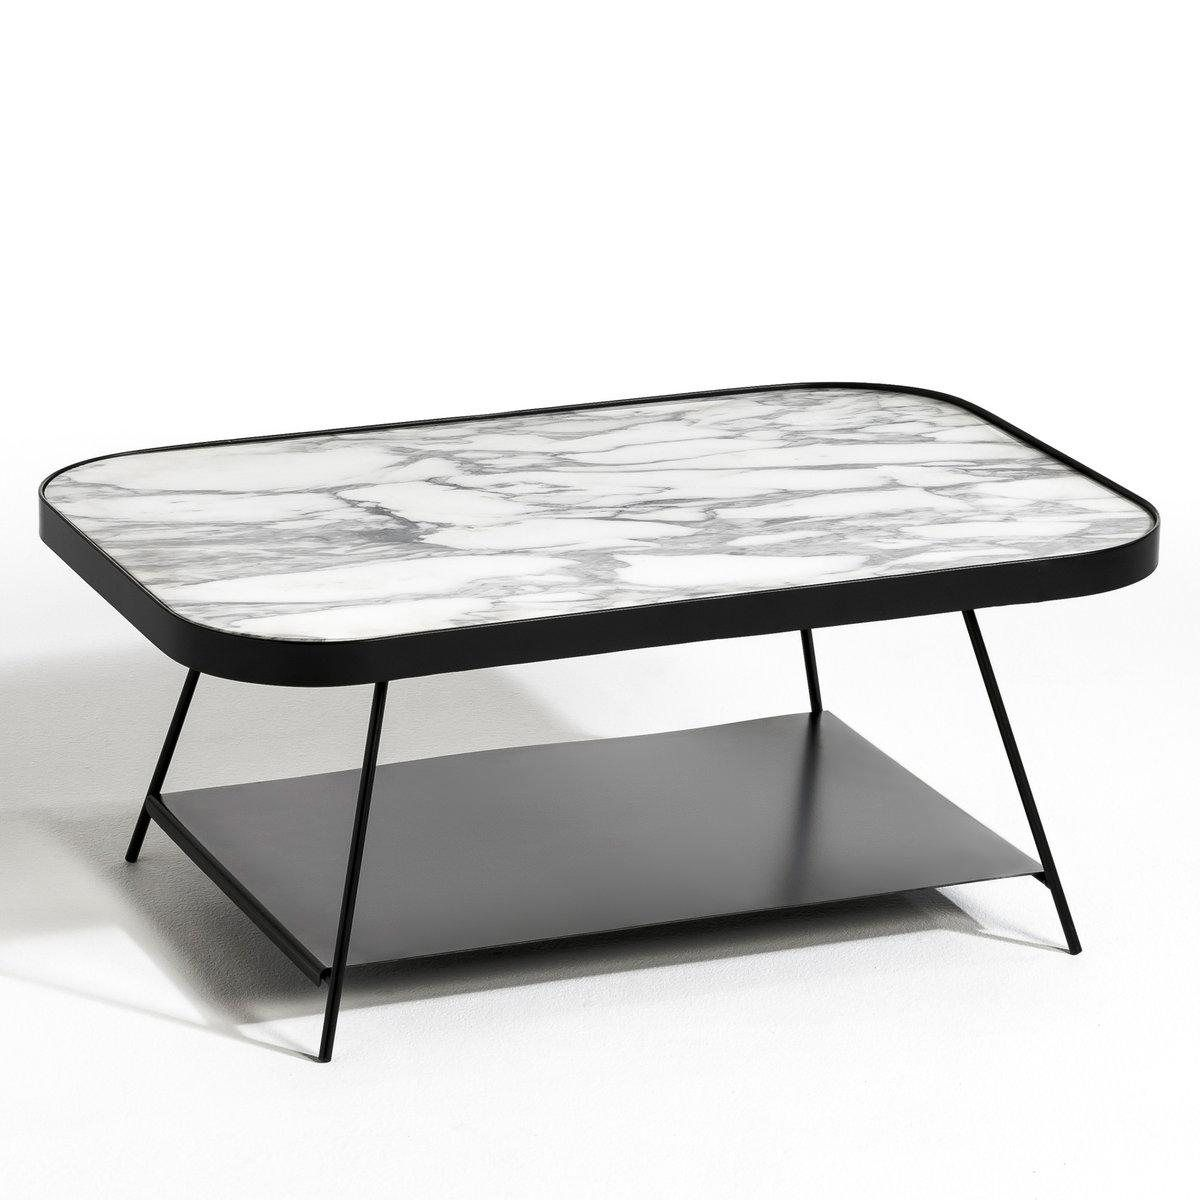 table basse marbre gemma design e gallina tables basses pinterest table basse table. Black Bedroom Furniture Sets. Home Design Ideas